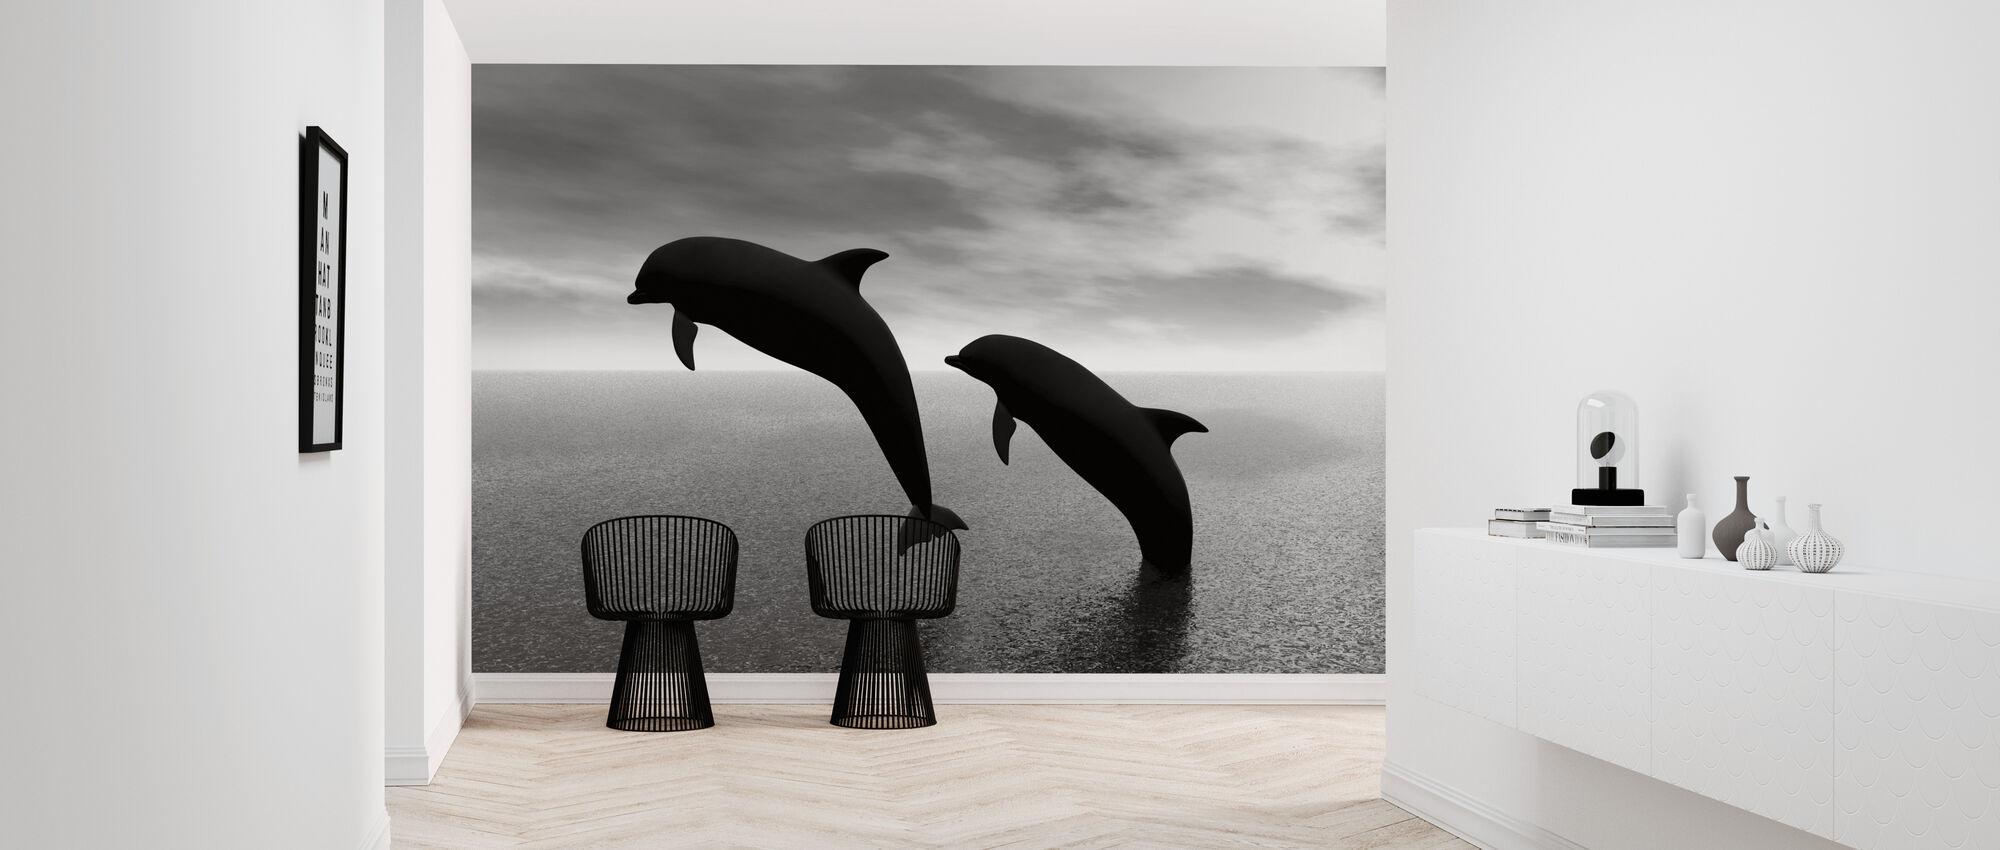 Dolphin Silhouettes - b/w - Wallpaper - Hallway